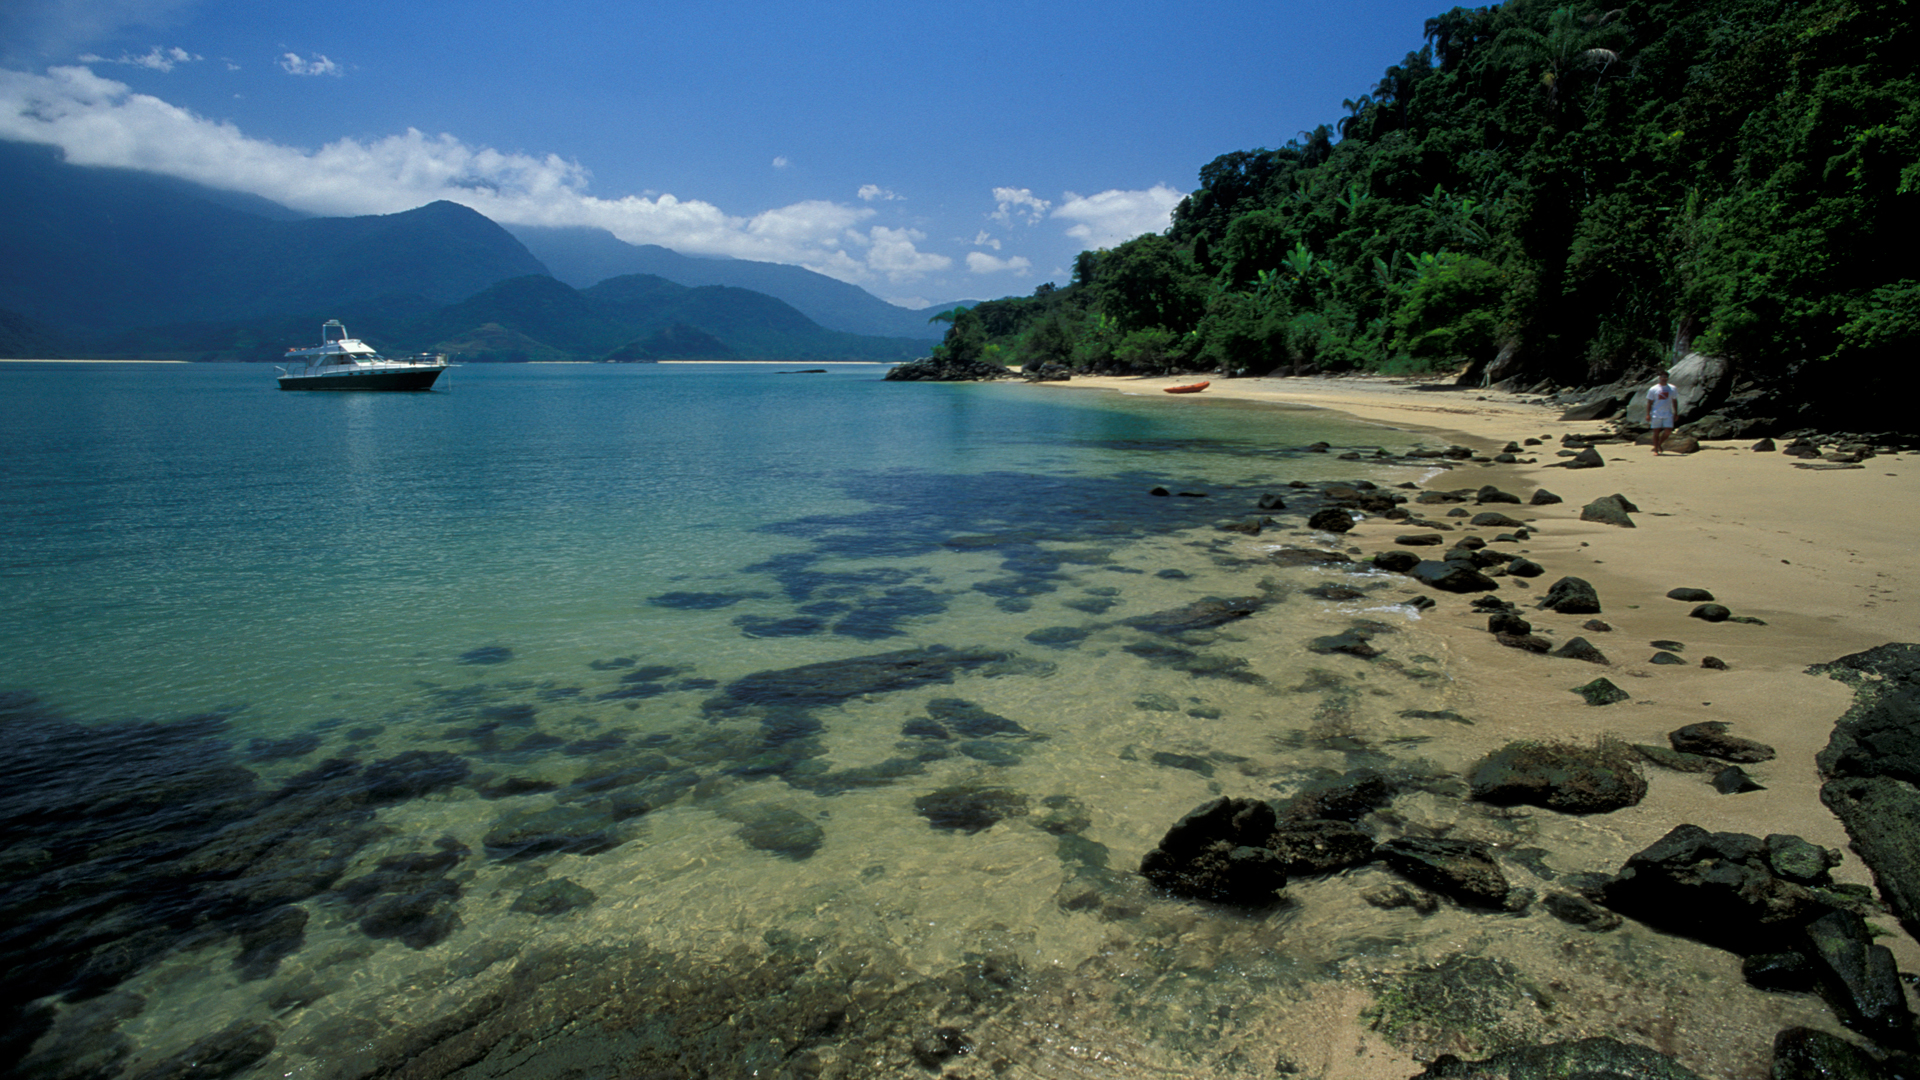 Aparecida 2019 Best Of Aparecida Brazil Tourism: TOP 5 PLACES IN BRAZIL WORTH CAPTURING